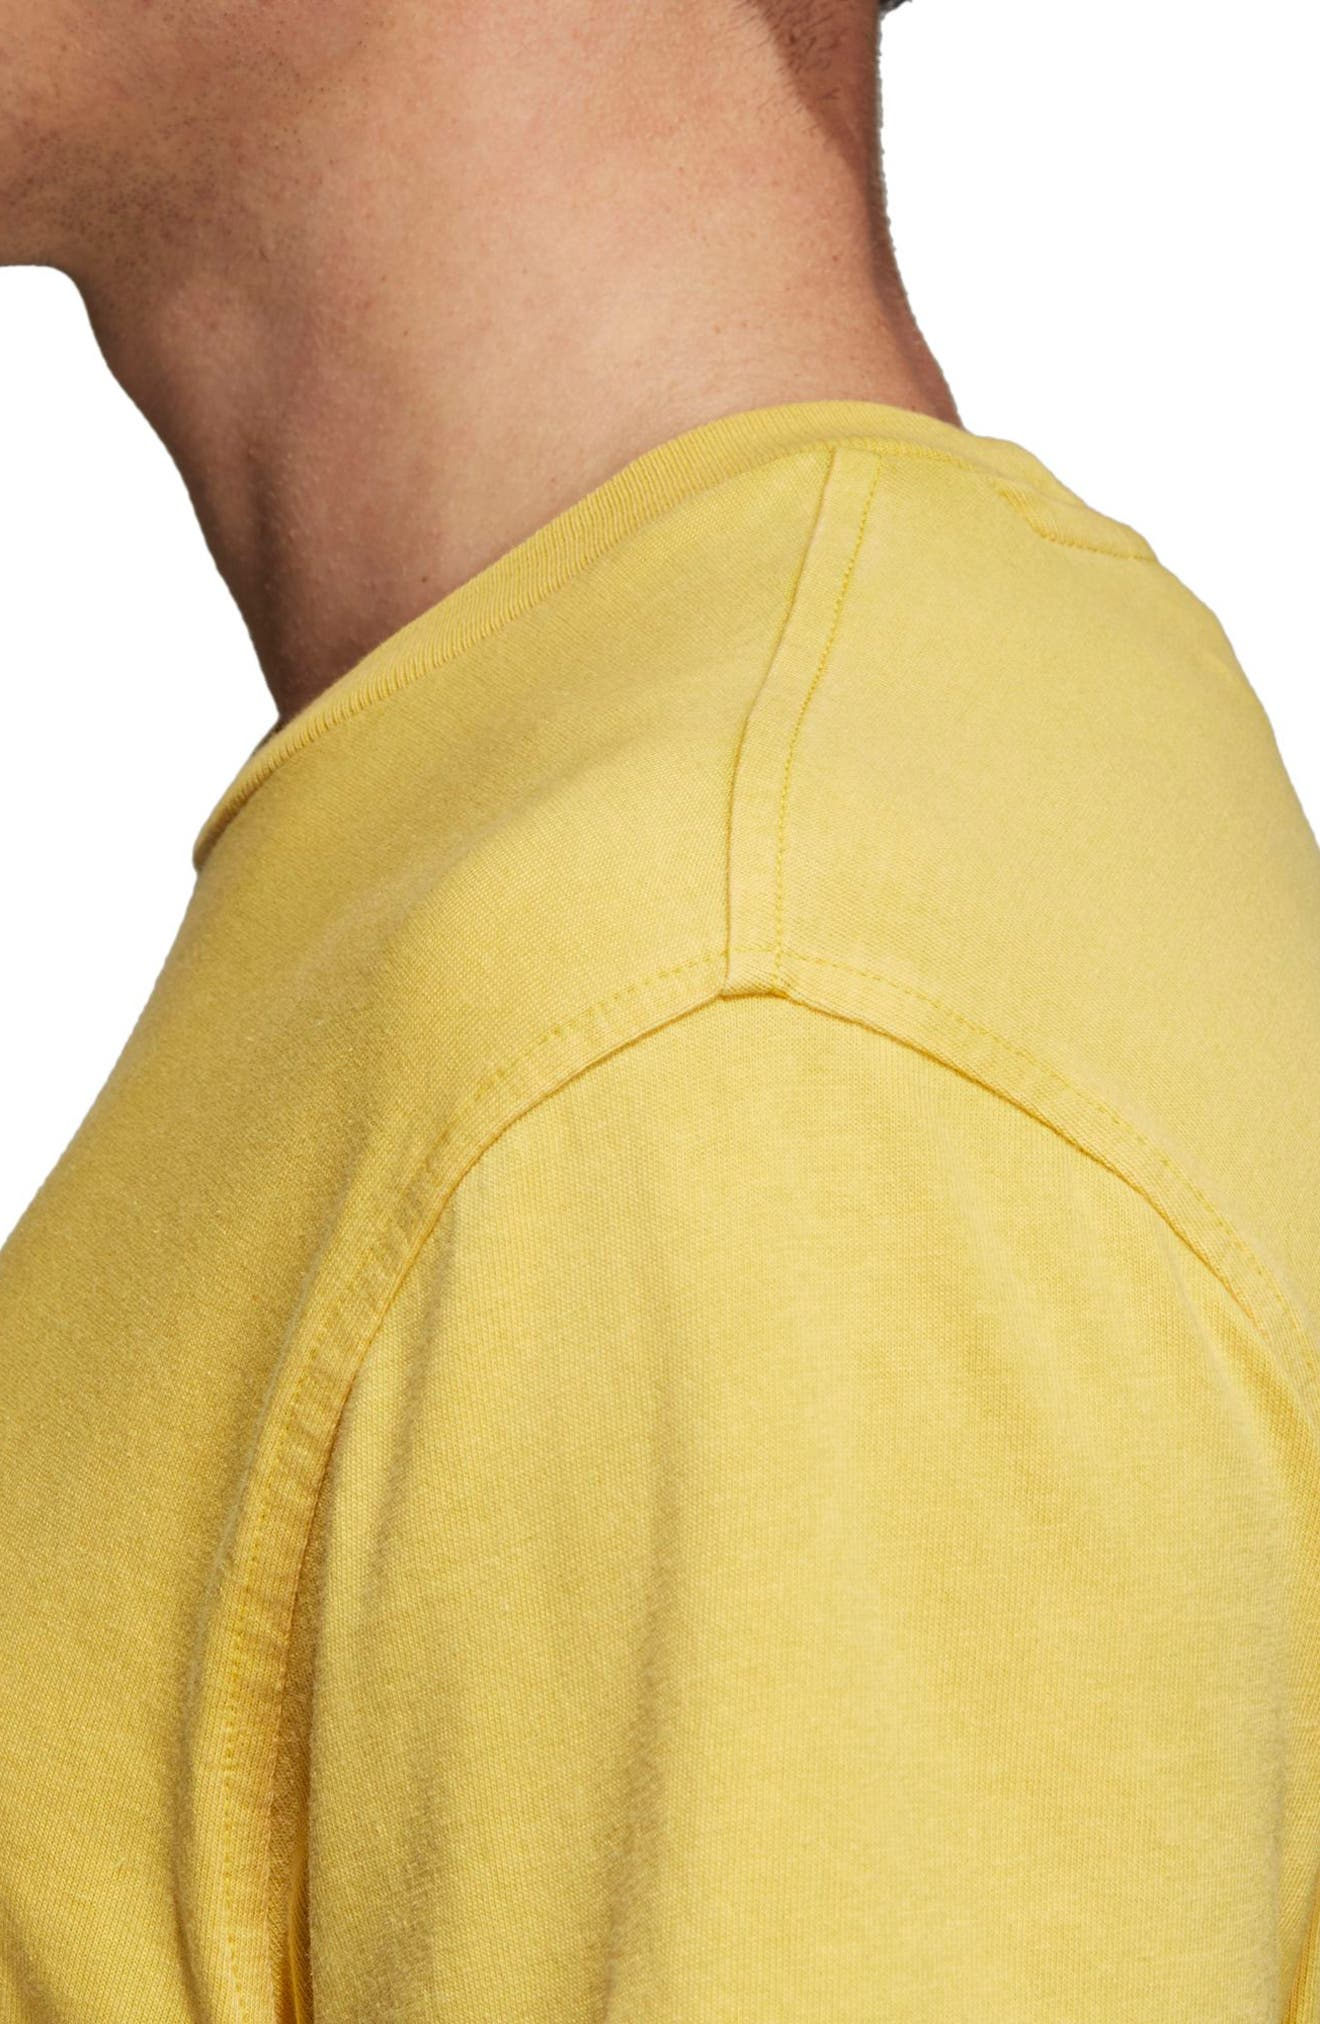 Trefoil T-Shirt,                             Alternate thumbnail 4, color,                             730